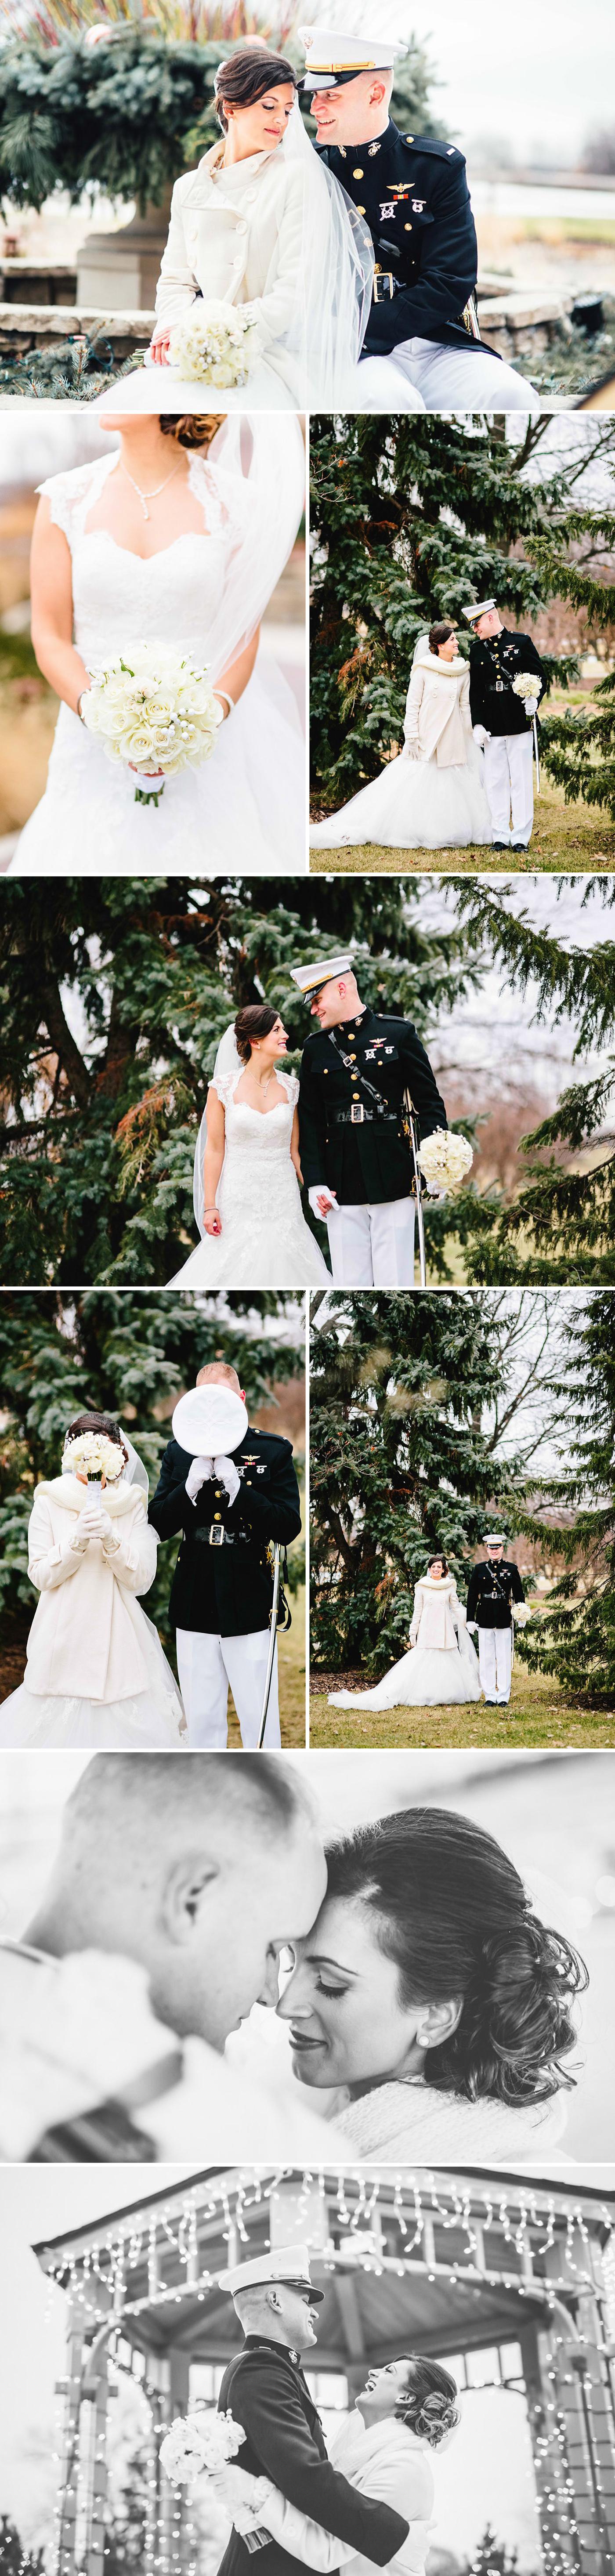 chicago-fine-art-wedding-photography-wesselink3